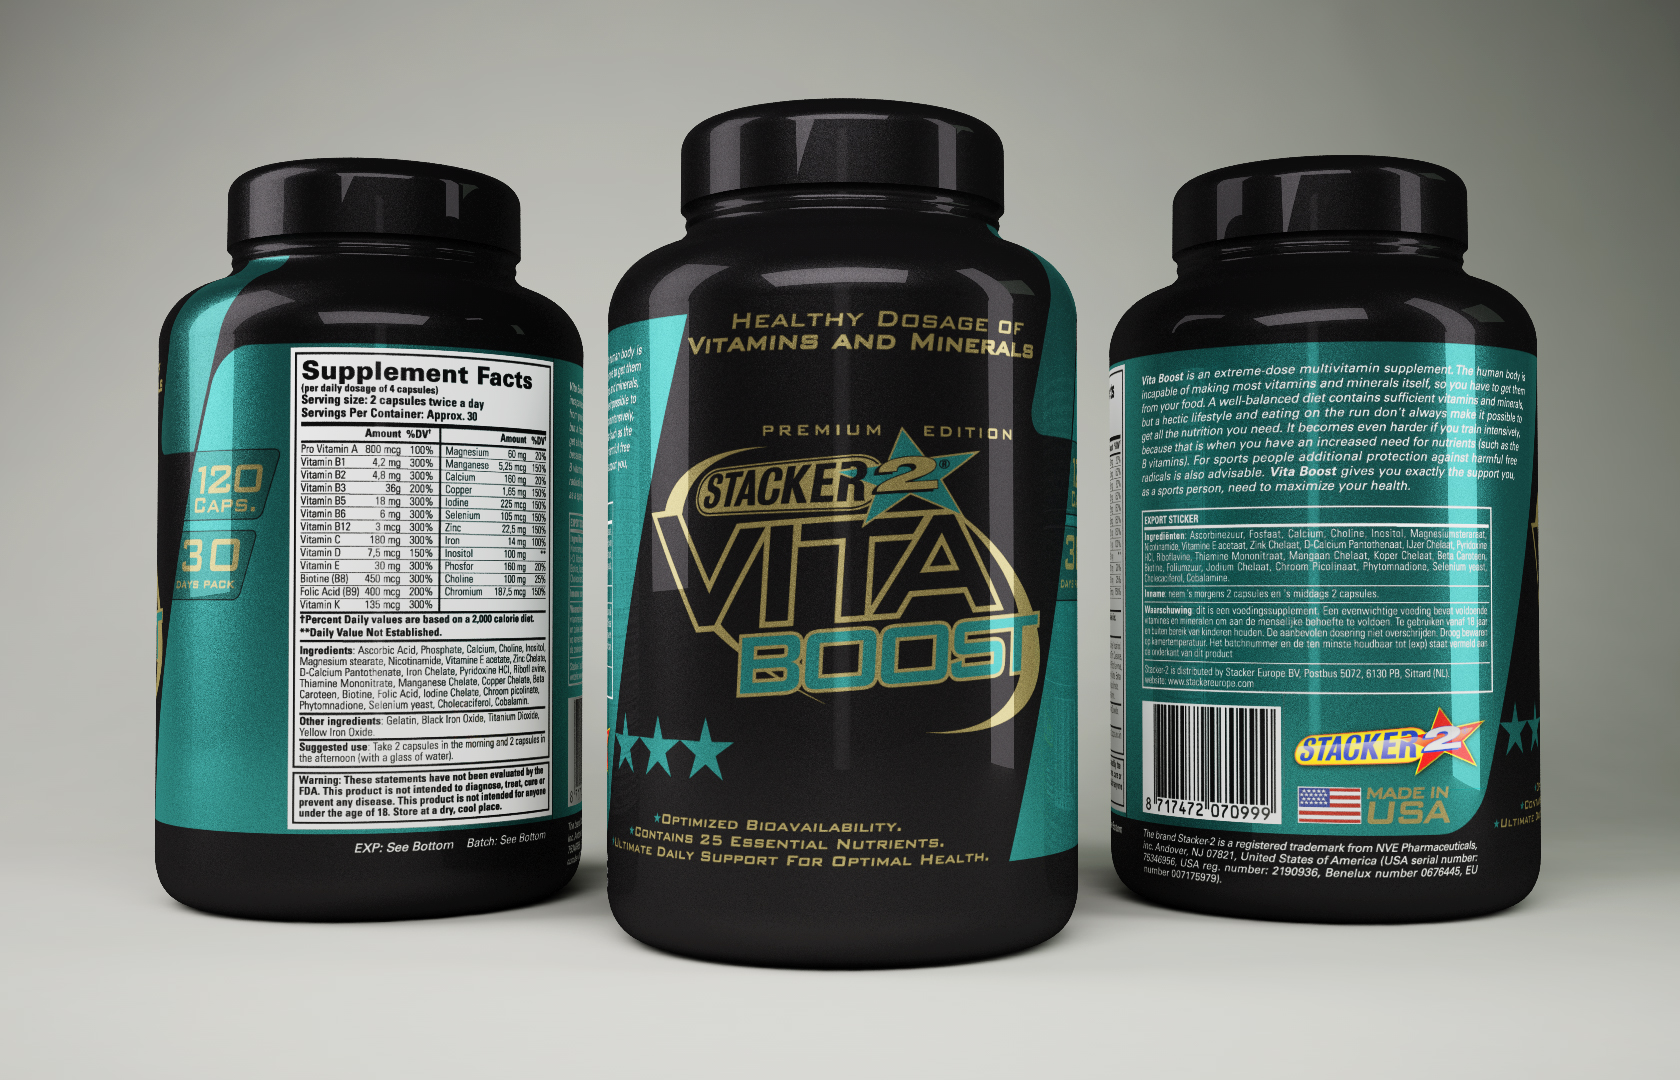 Stacker Vita Boost